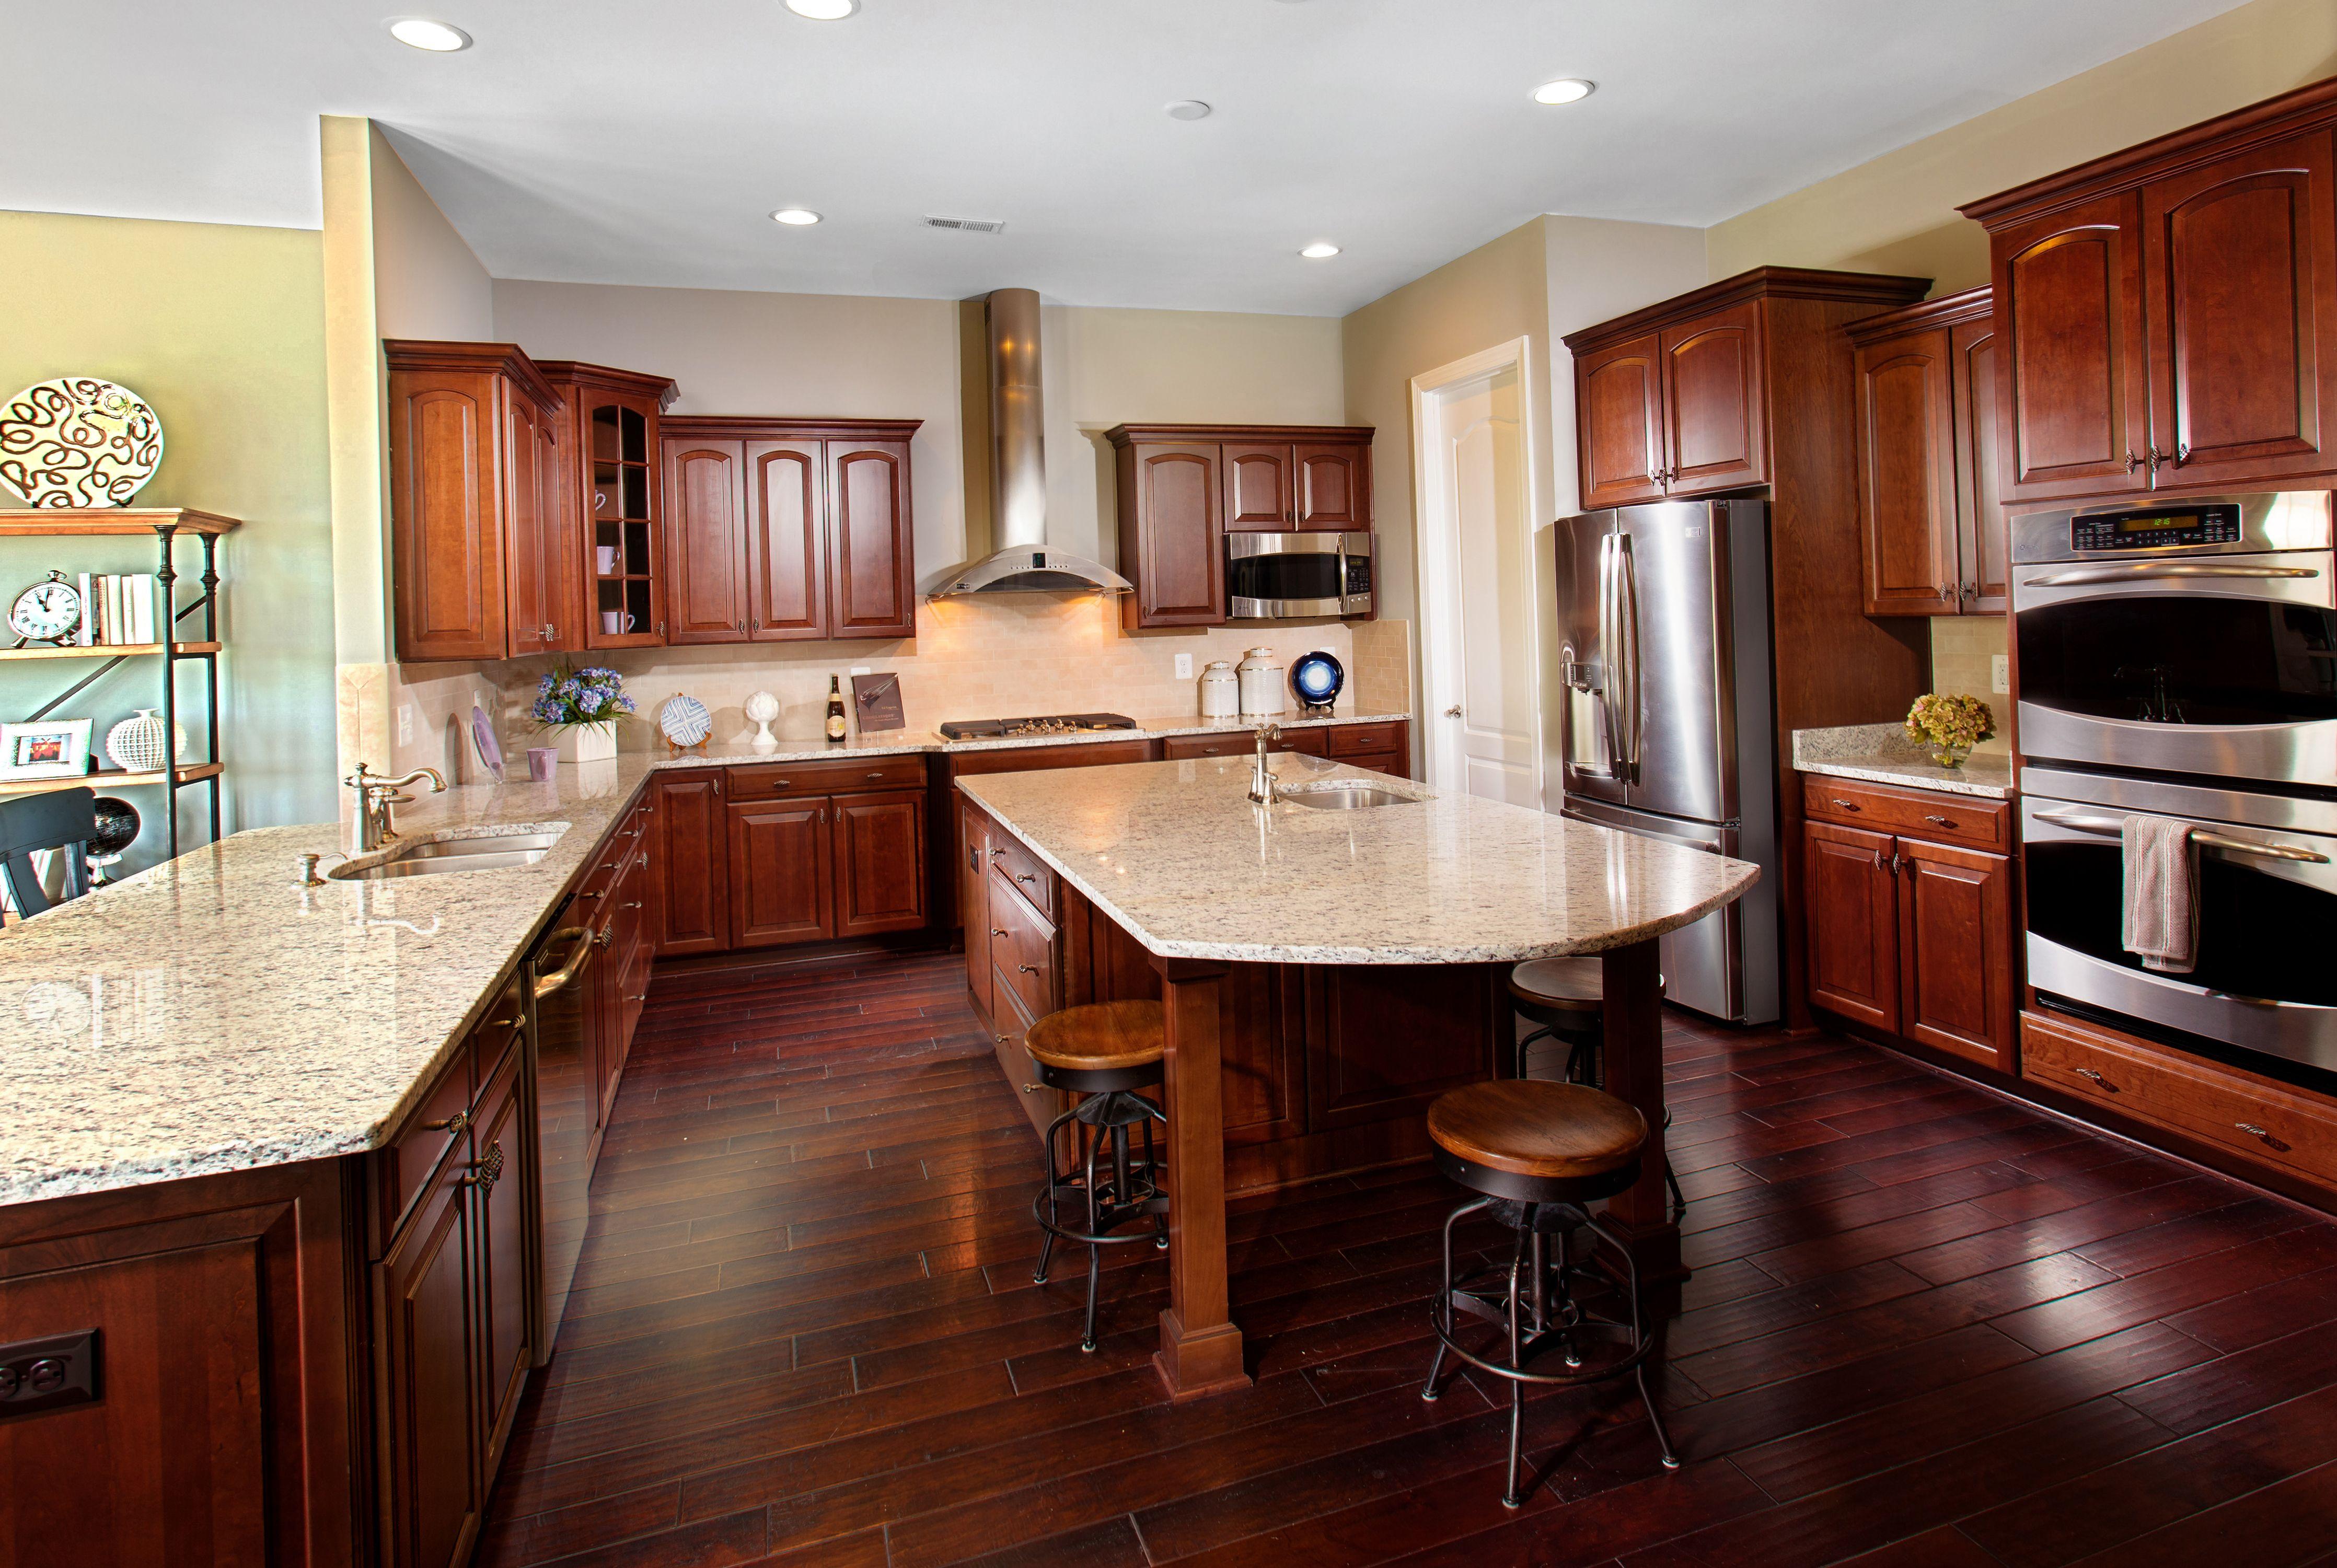 northridge model interior kitchen kitchen interior kitchen home on kitchen interior luxury id=76461